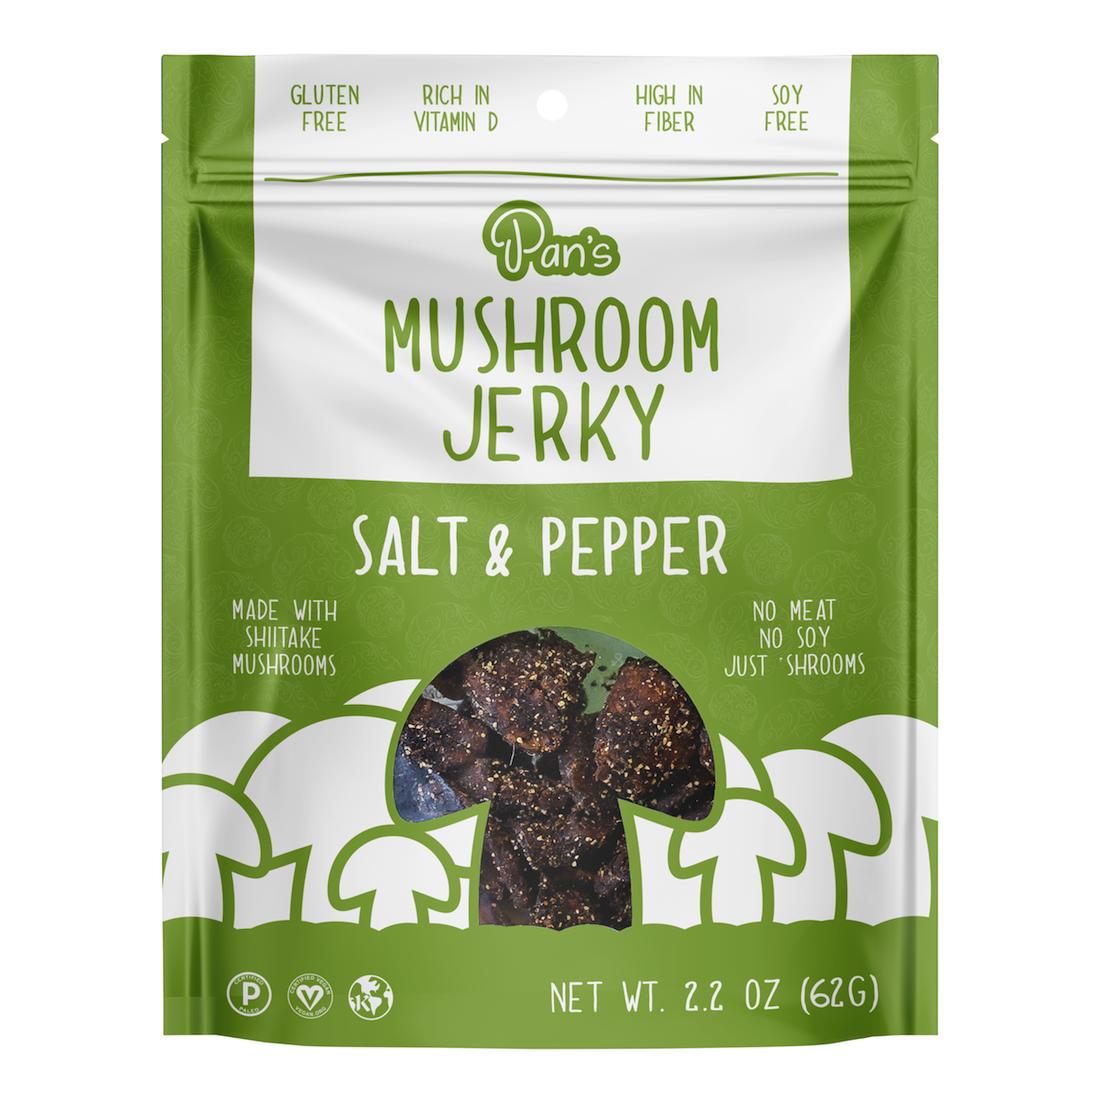 Salt & Pepper - Pan's Mushroom Jerky - Certified Paleo, PaleoVegan by the Paleo Foundation